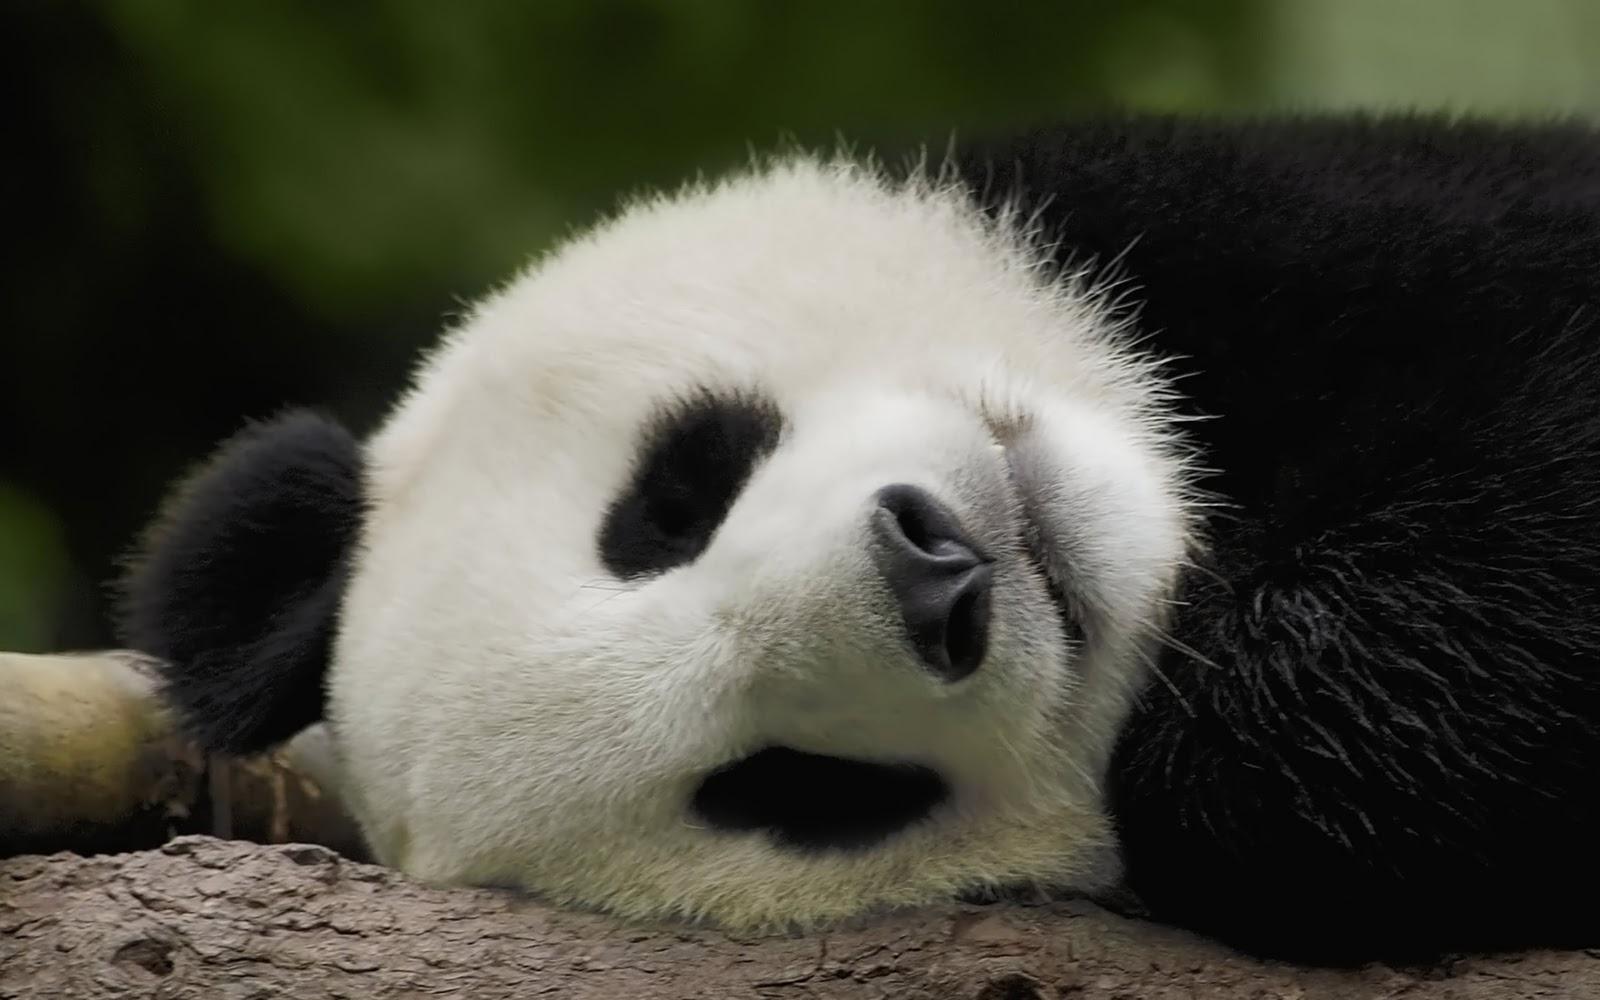 http://1.bp.blogspot.com/-MQ1a5PO2X2I/TsH8Vtddq3I/AAAAAAAAErU/qZqmY5npfbw/s1600/sleeping-panda-wallpaper-1920x1200.jpg